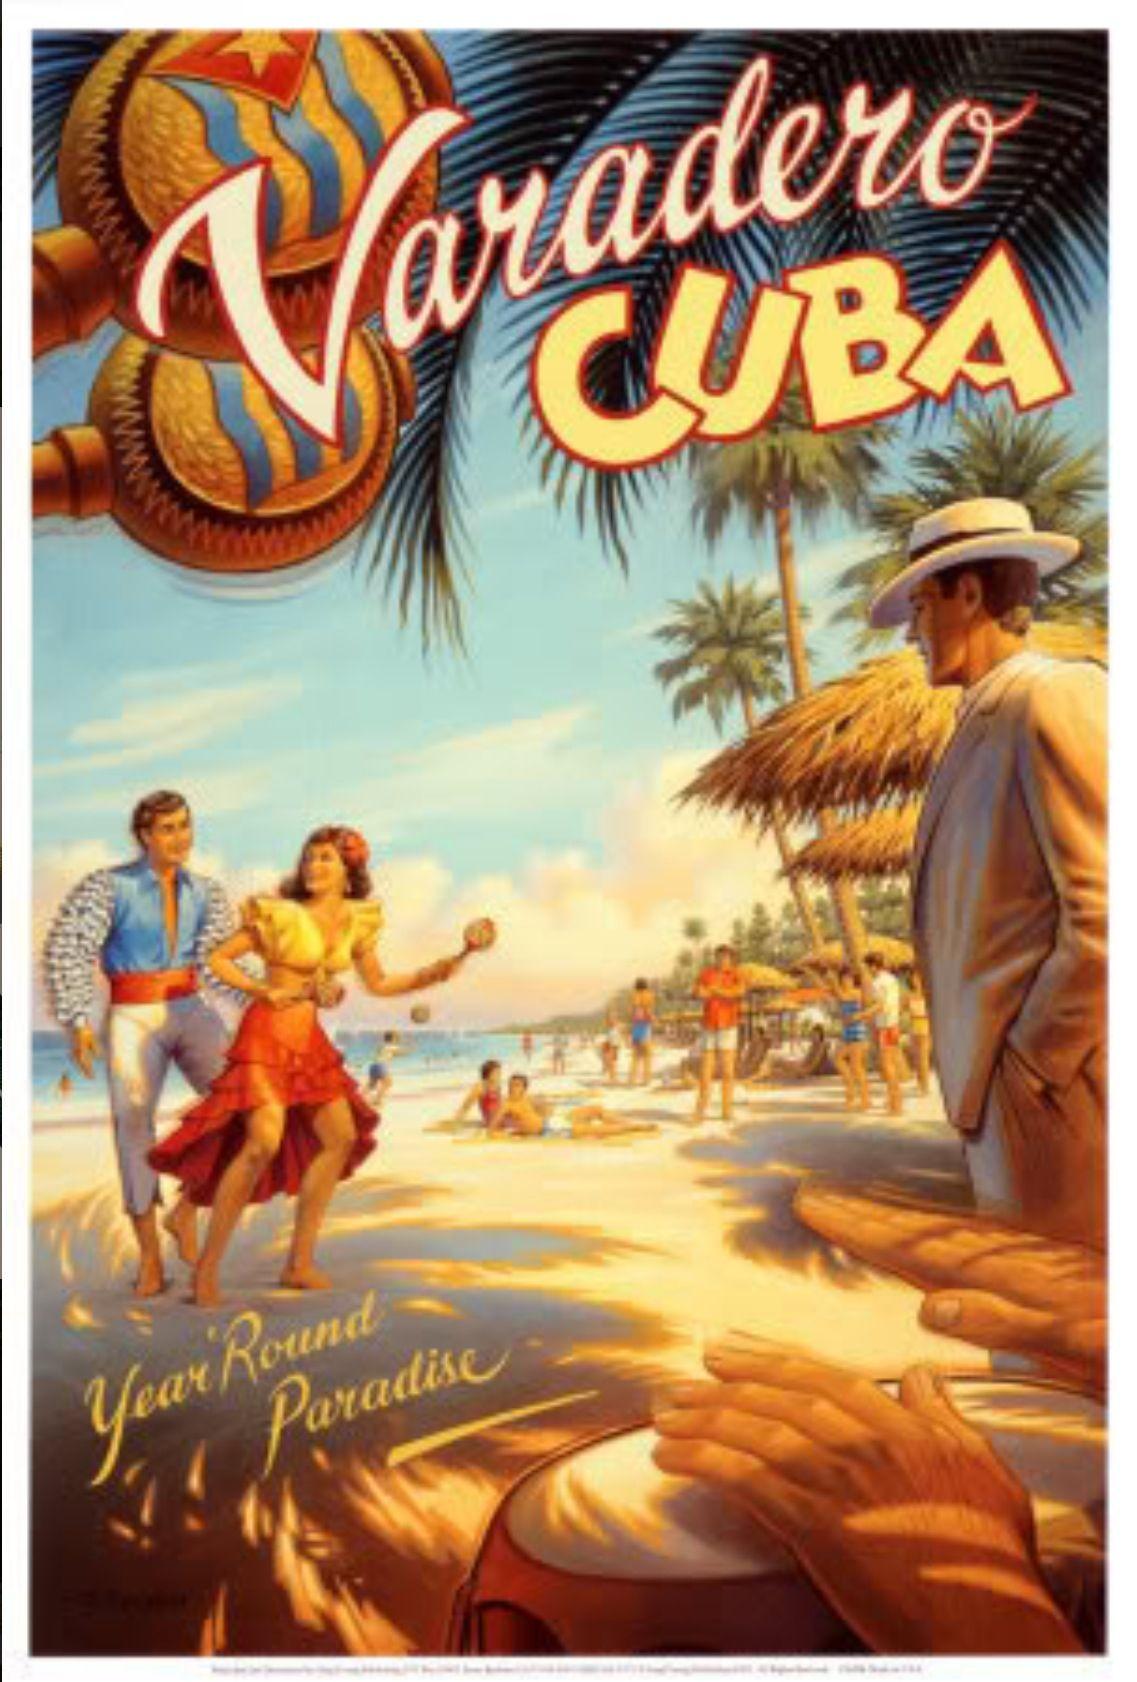 Cuba. Vintage travel poster for Varadero. | Vintage Travel Posters ...